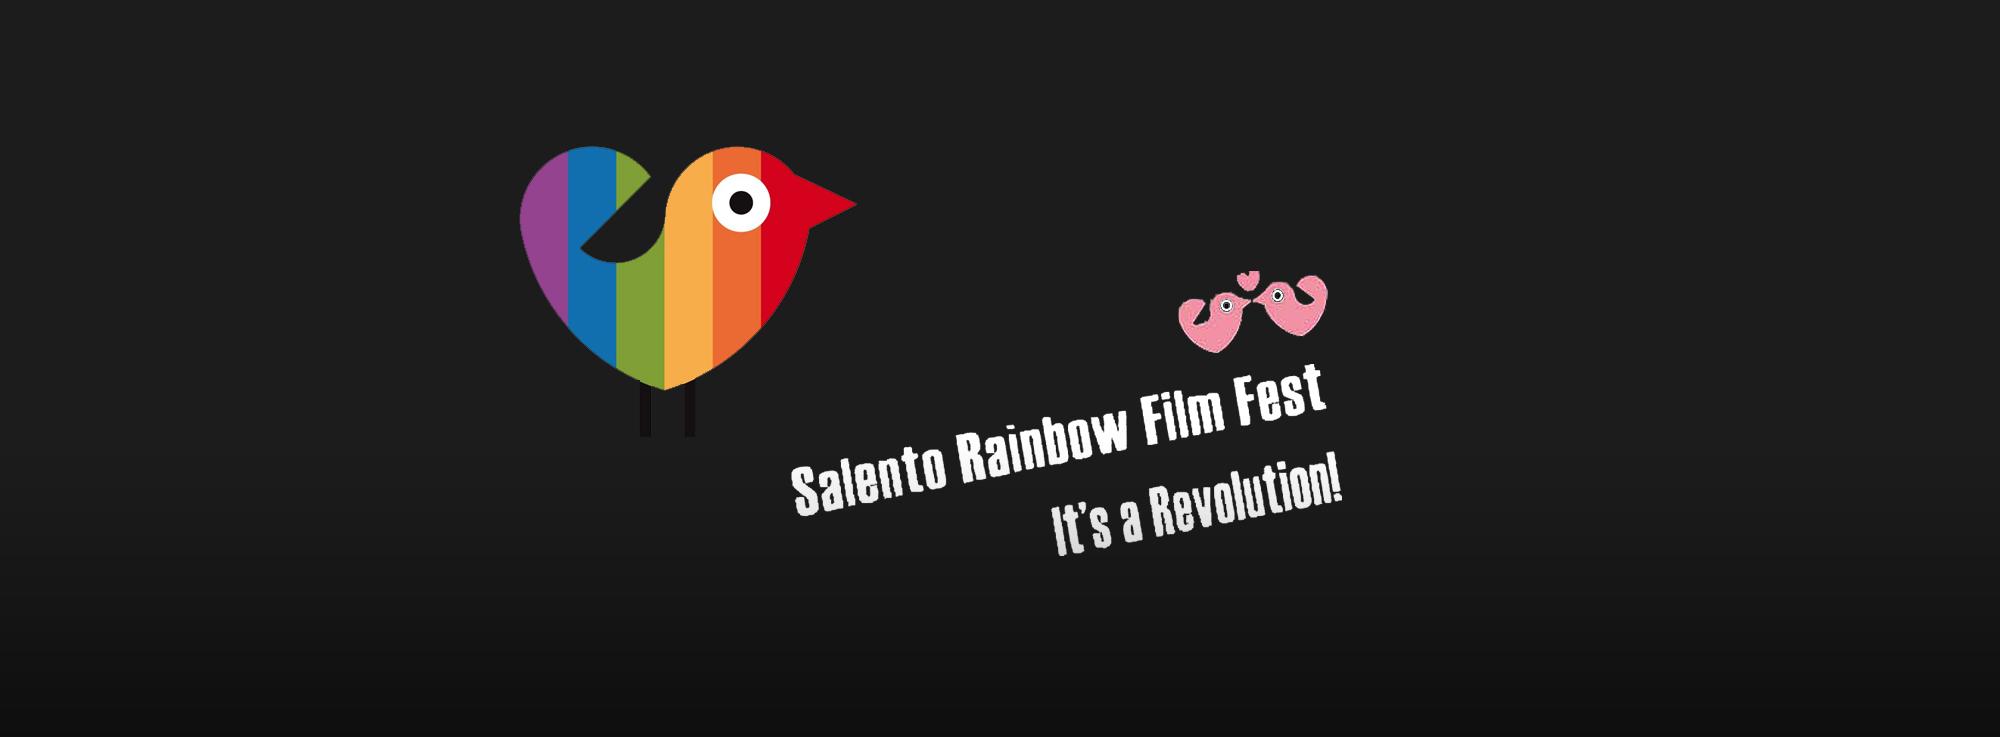 Lecce: Salento Rainbow Film Fest